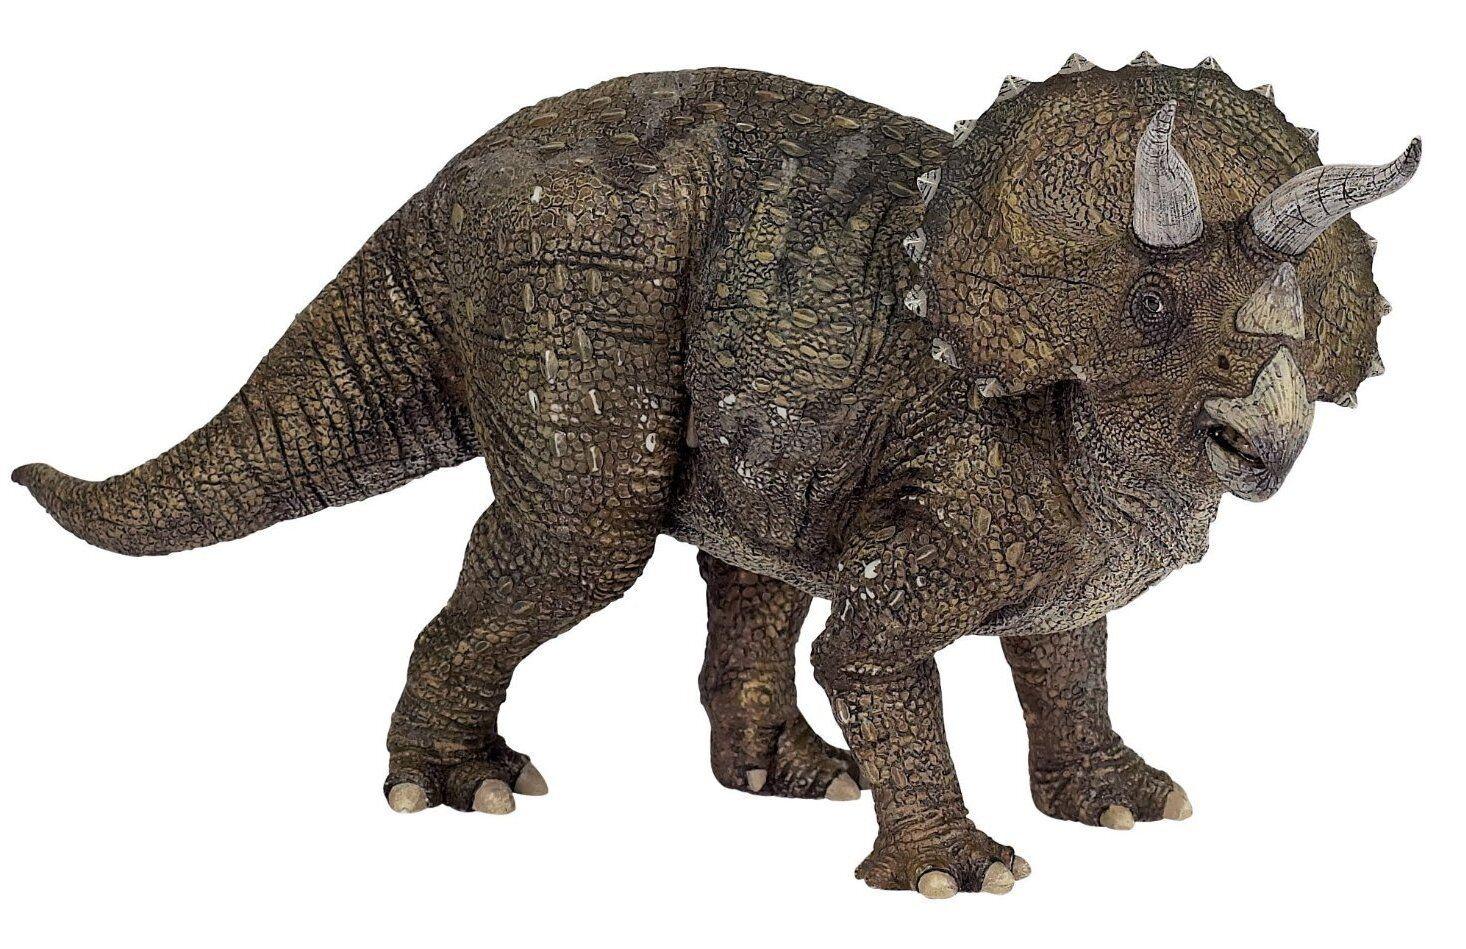 Figuras Figuras Figuras Papo Dinosaurio Stegosaurus, DILOPHOSAURUS, Dinosaurios, alosaurio Etc 5fe9c4